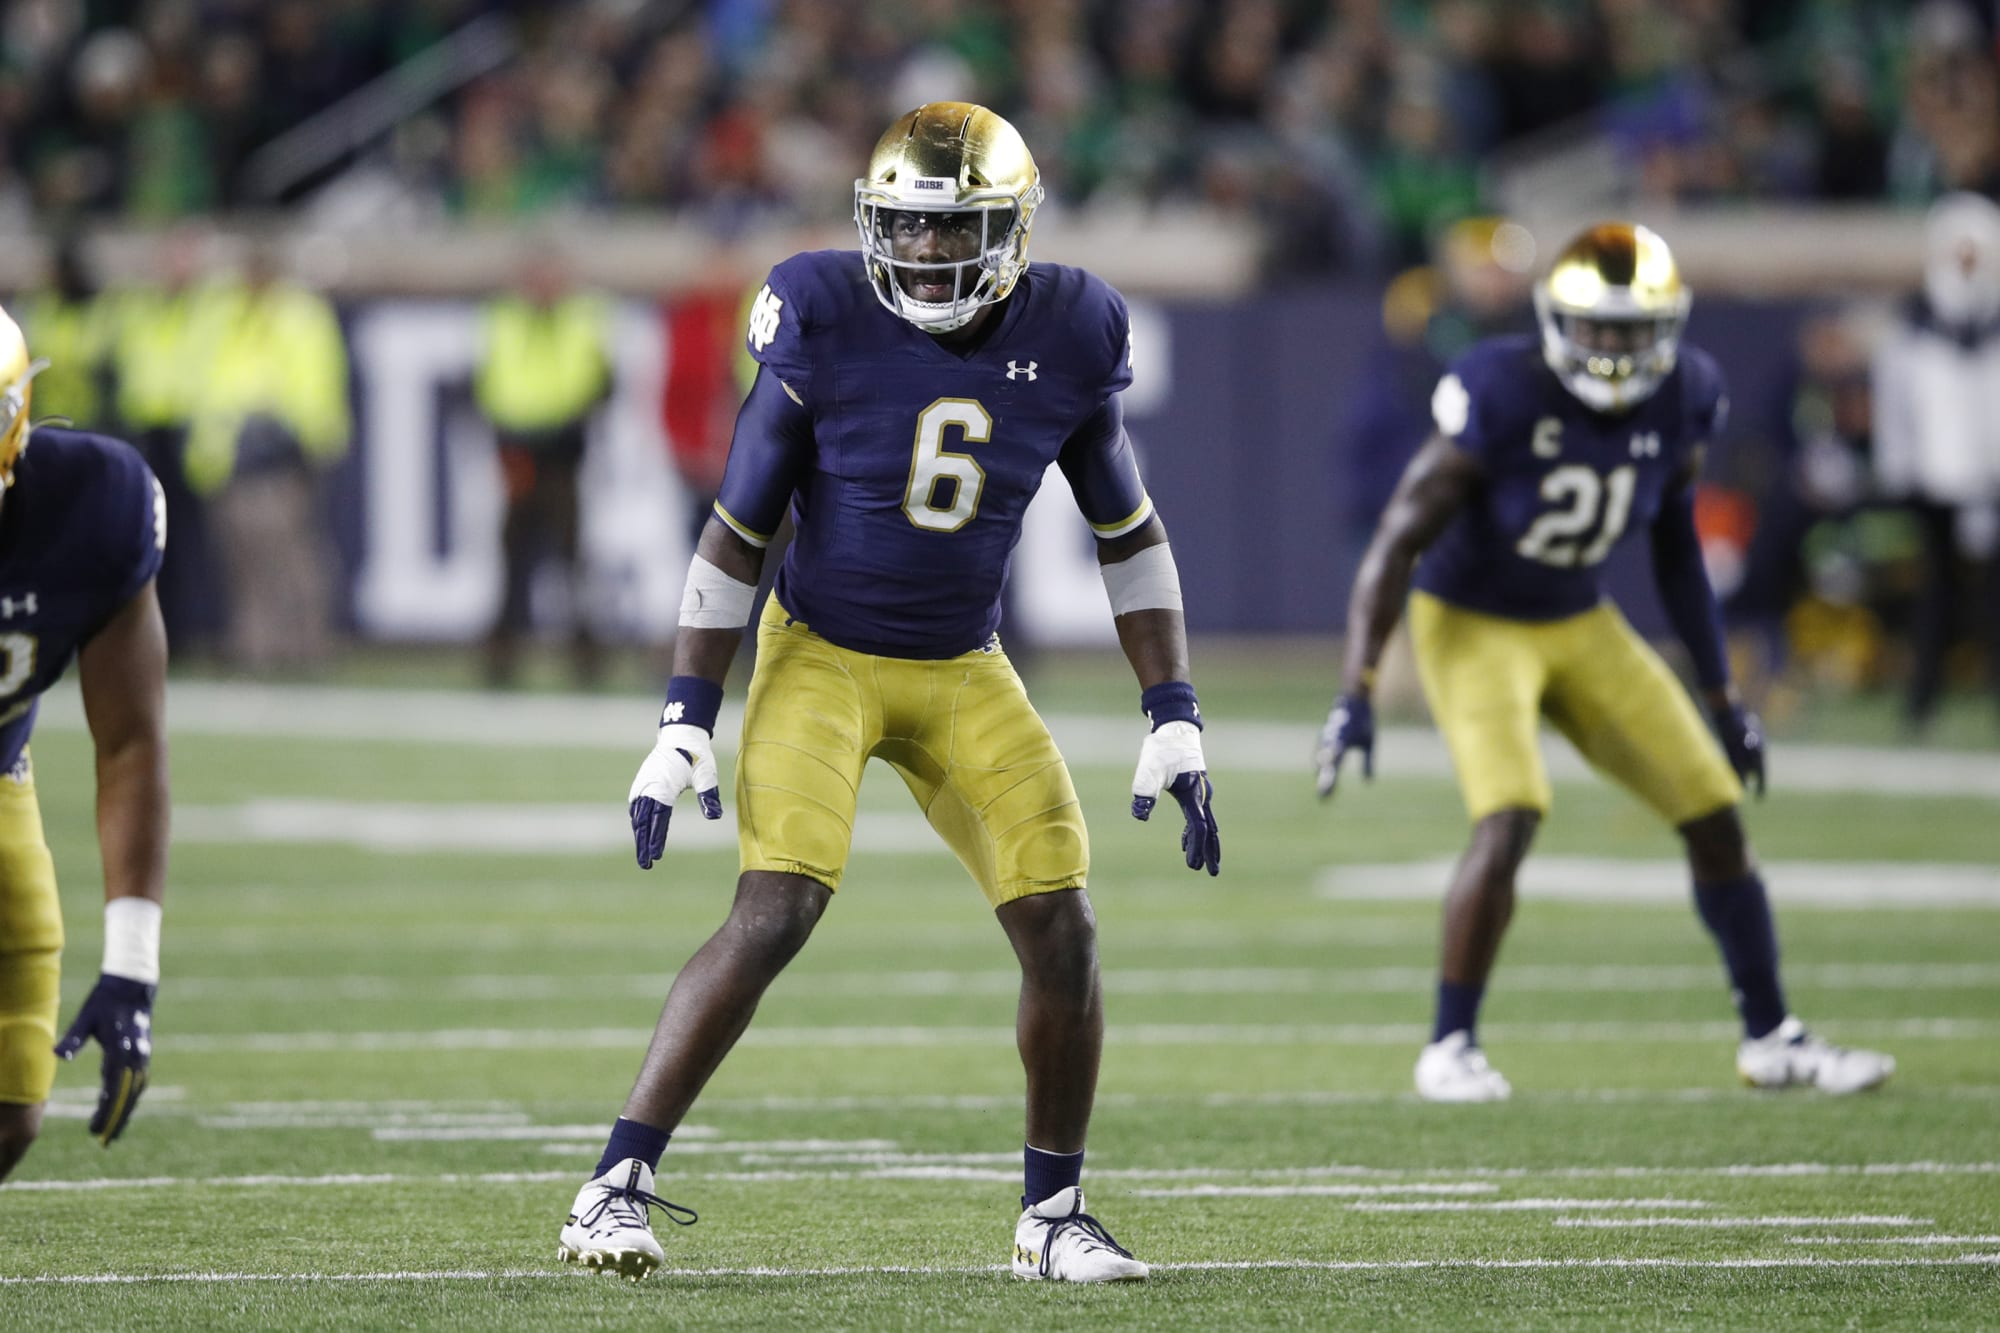 Notre Dame Football: Is Jeremiah Owusu-Koramoah being undervalued?